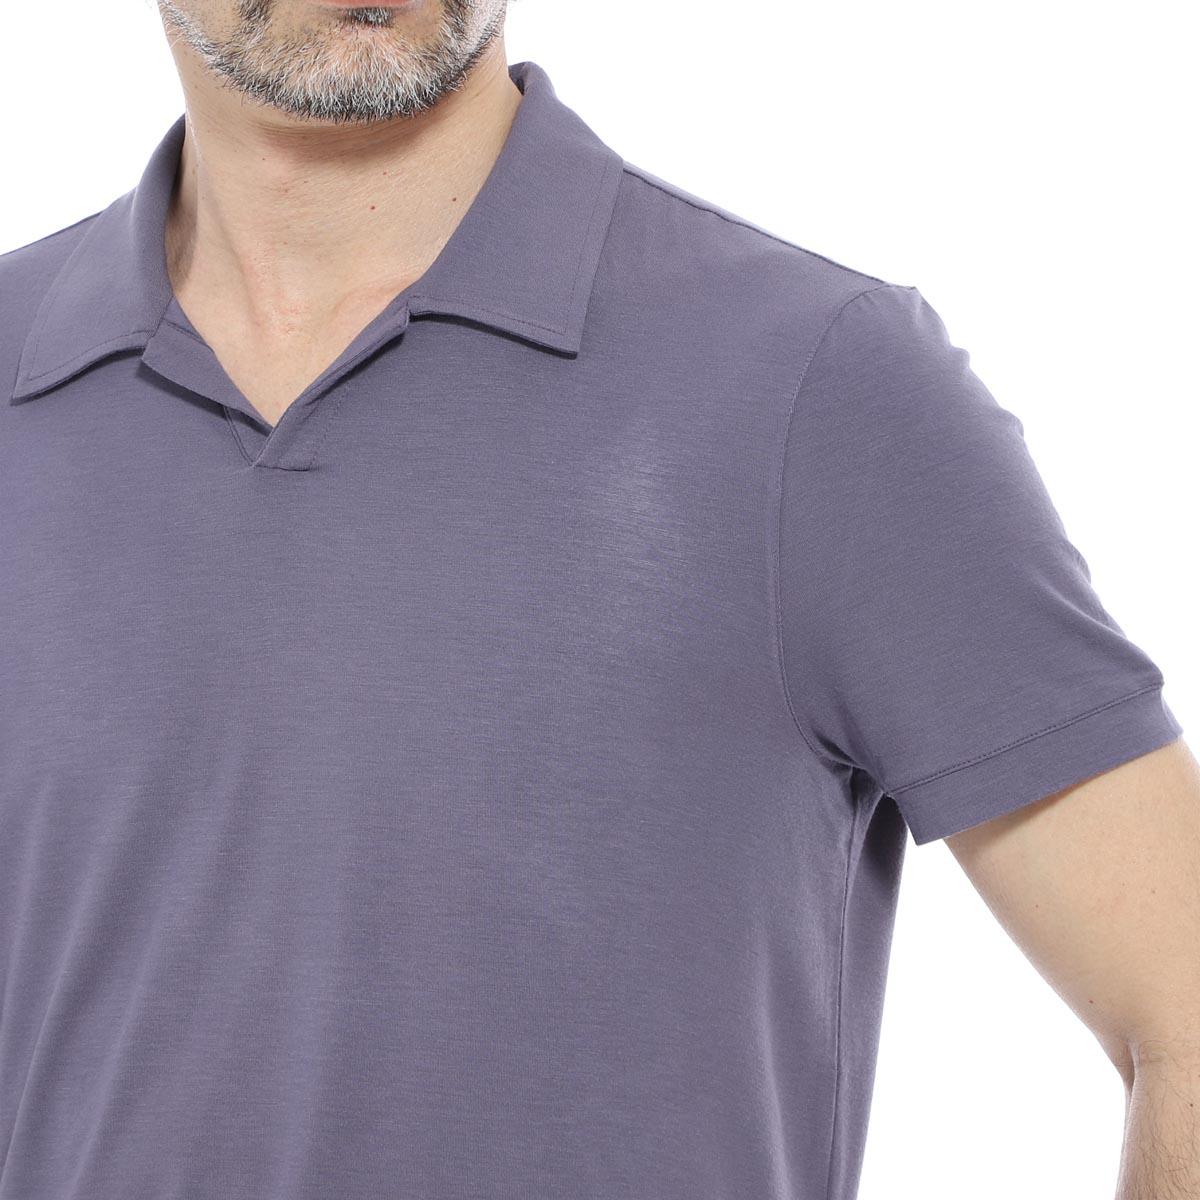 66edfaf434 Giorgio Armani GIORGIO ARMANI skipper polo shirt men casual tops inner  sports golf 3gsf51 sjp4z u99z STRETCH VISCOSE JERSEY